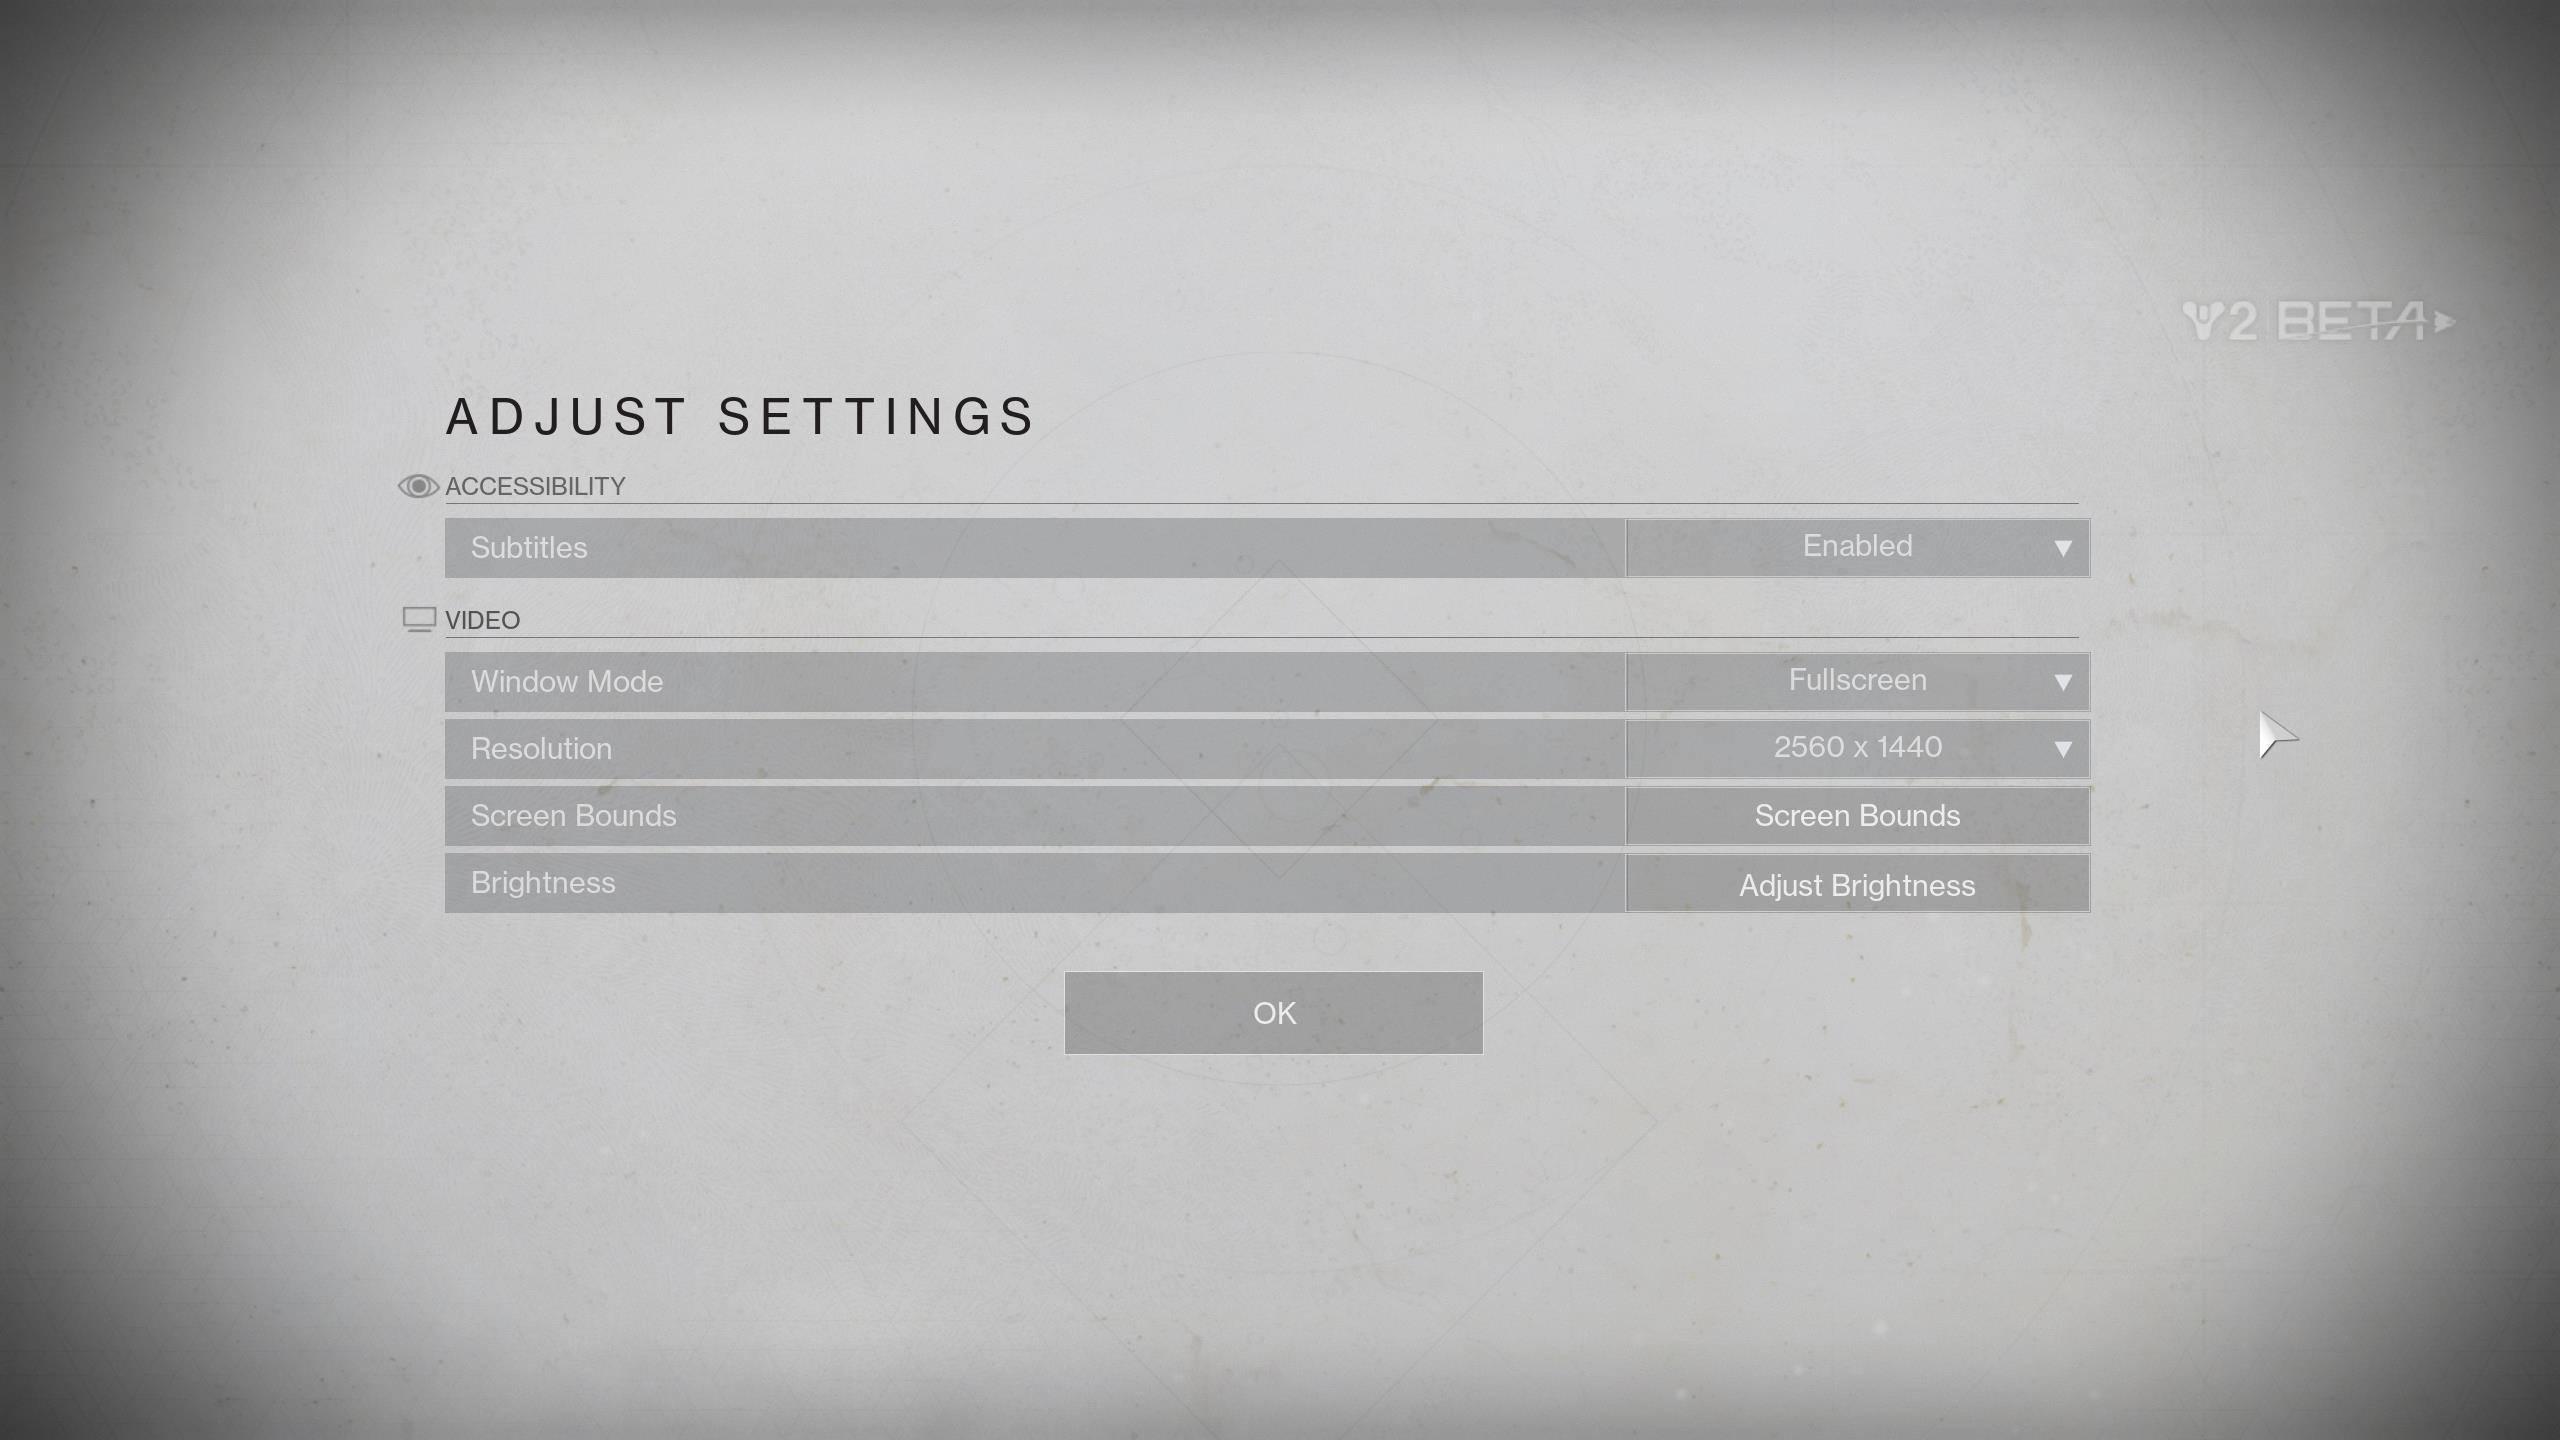 The Destiny 2 PC beta has an impressive settings menu - see